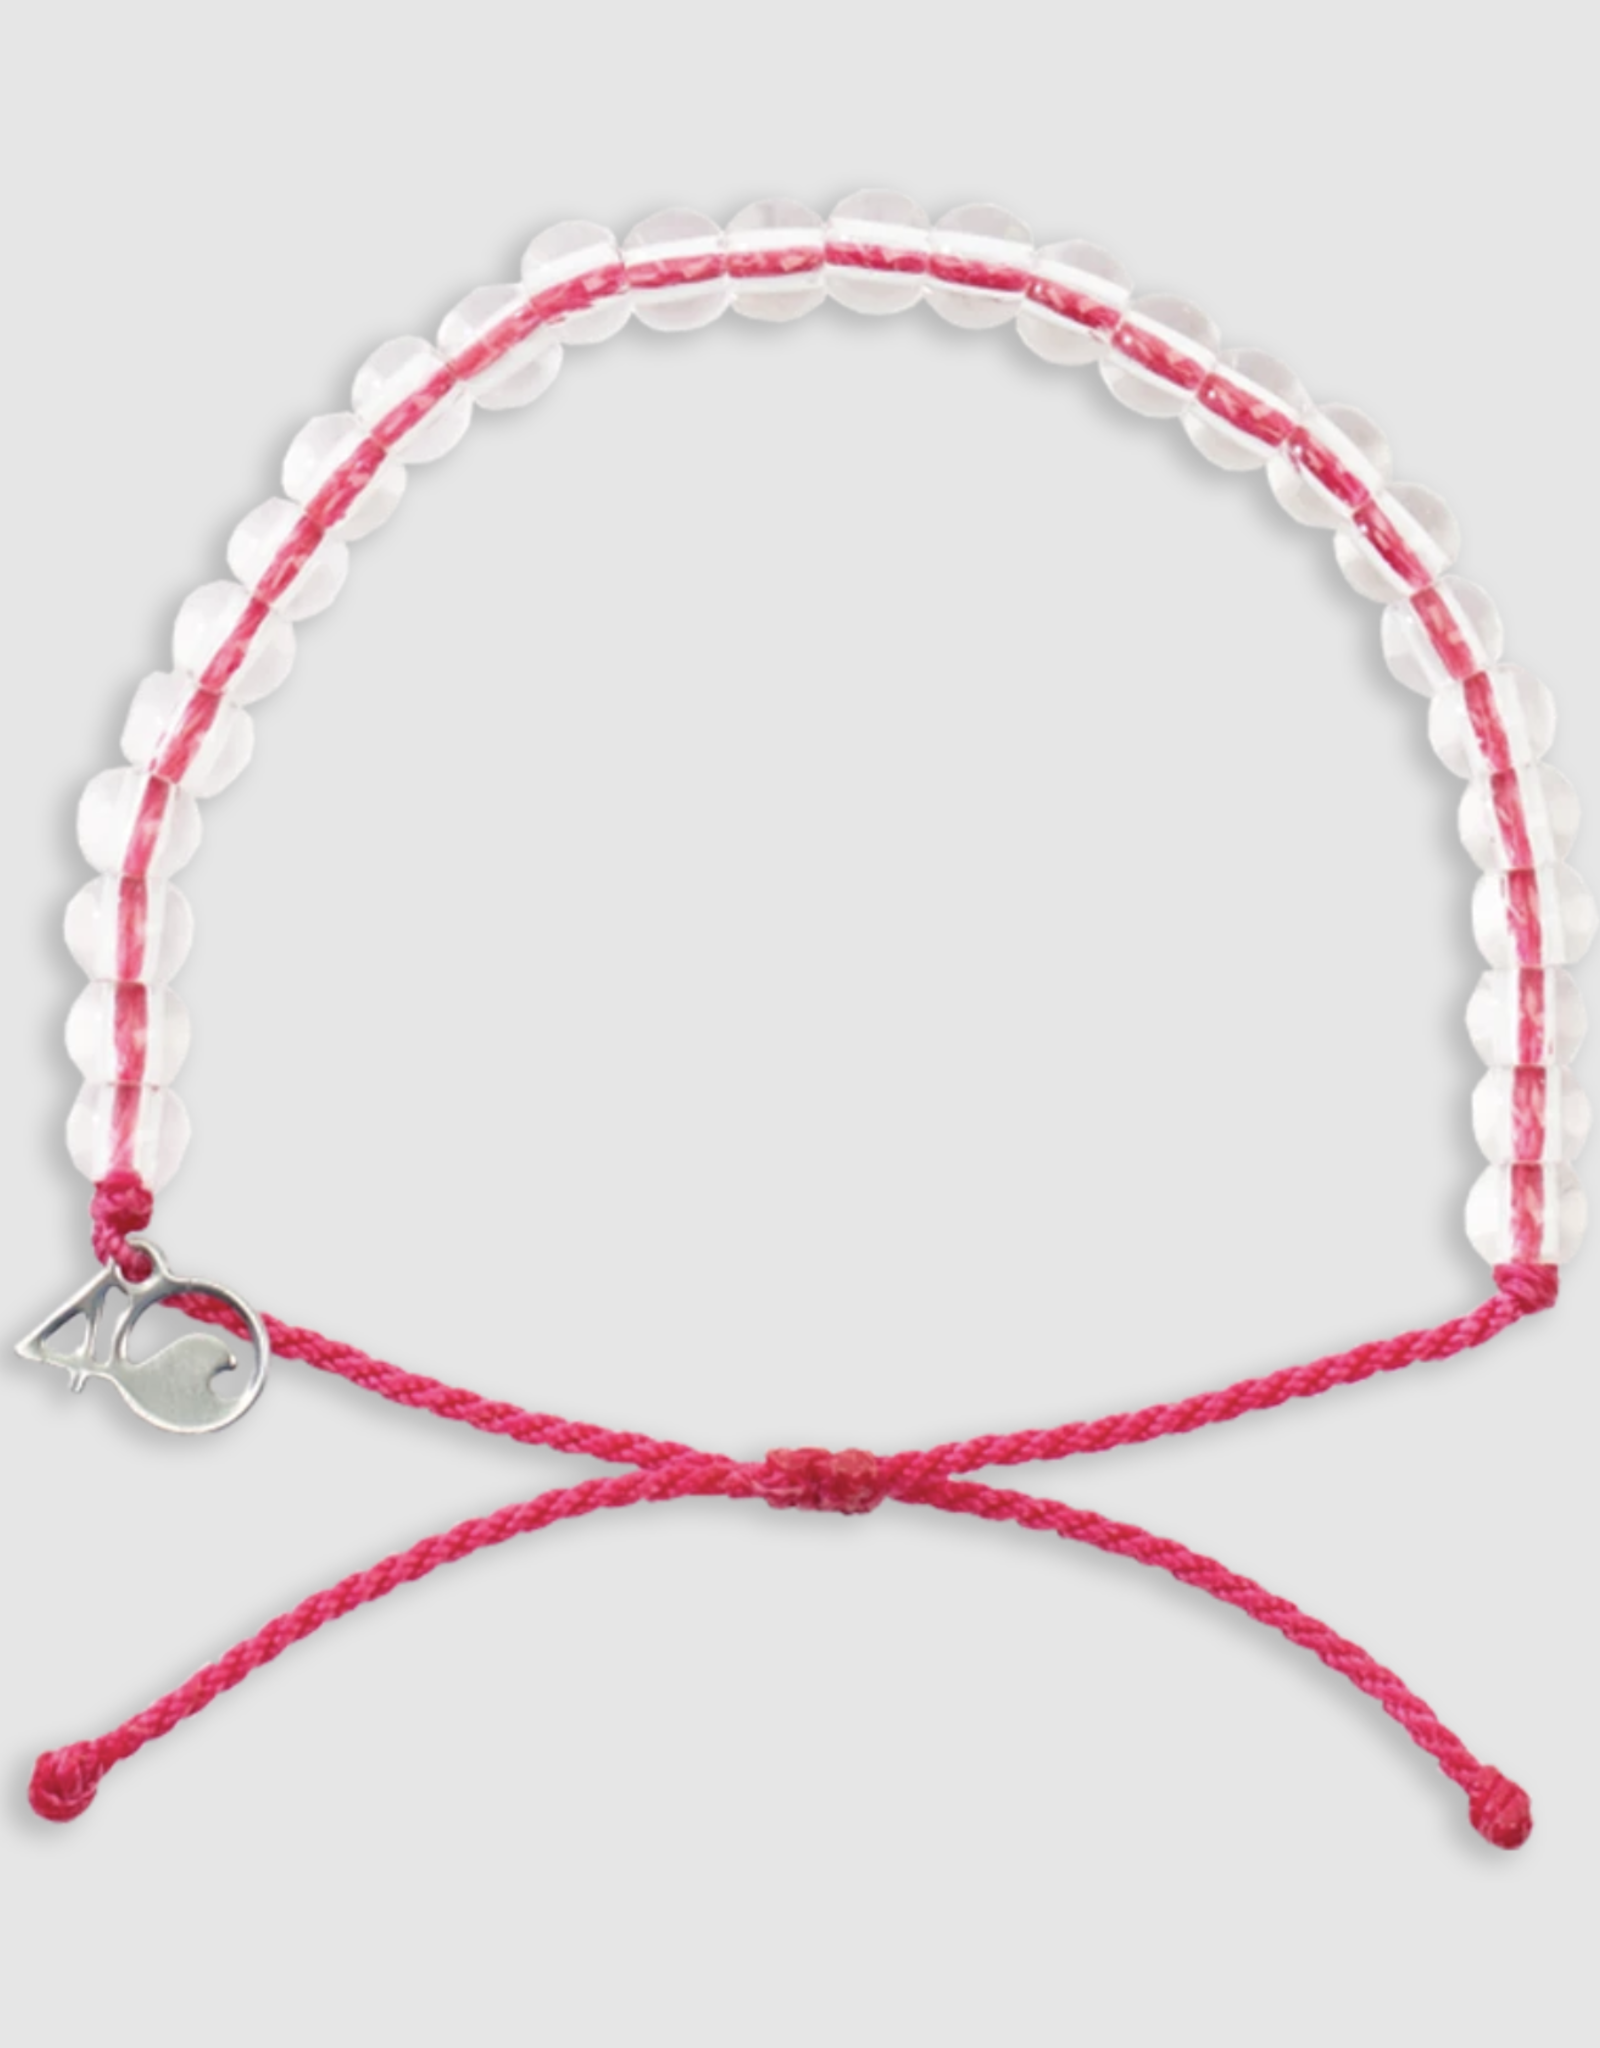 4Ocean 4Ocean - Bracelet Flamingo